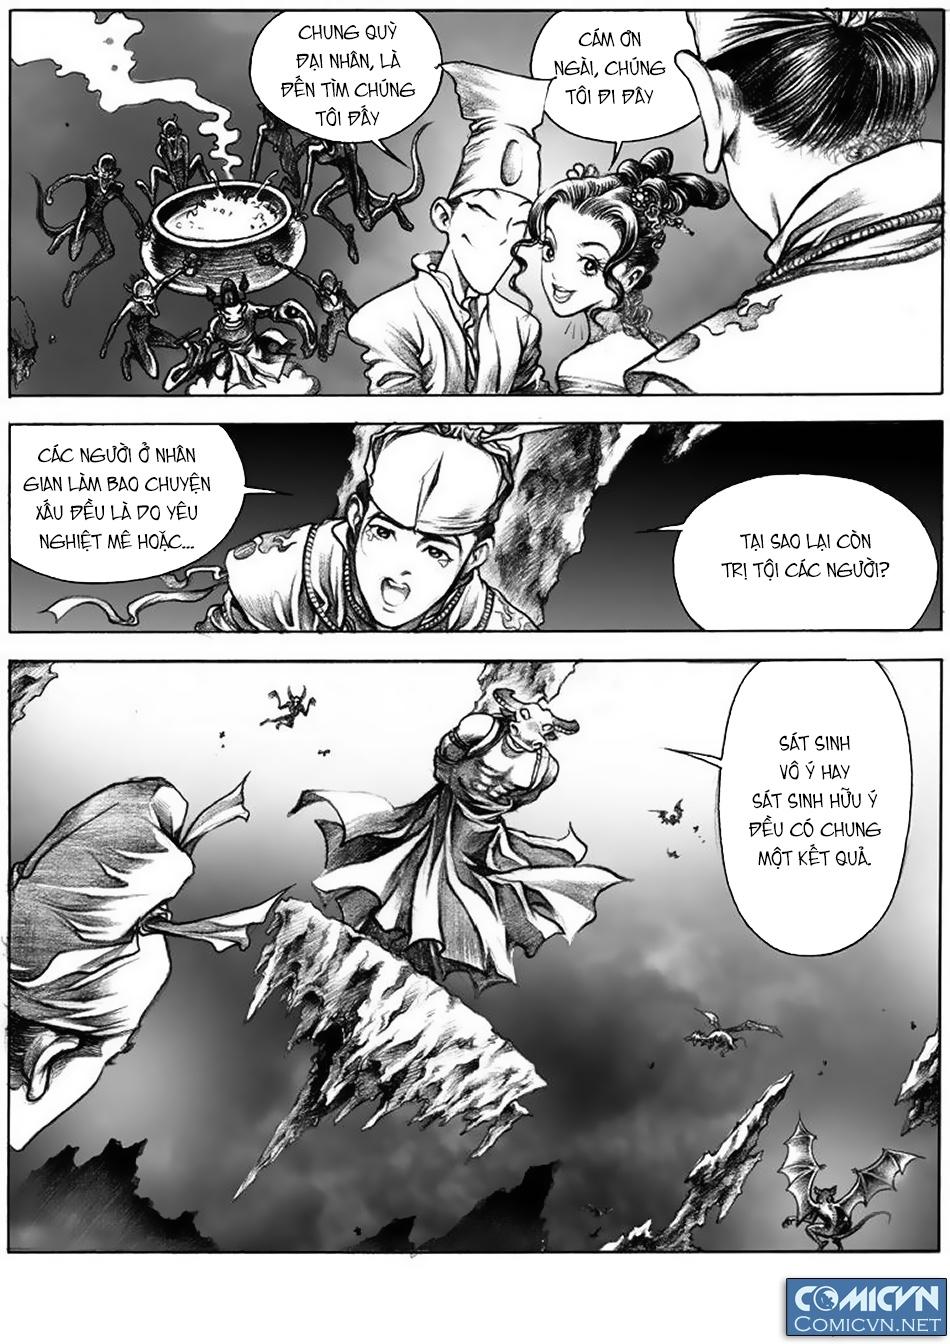 Chung Quỳ Truyền Kỳ Chapter 11 - Hamtruyen.vn